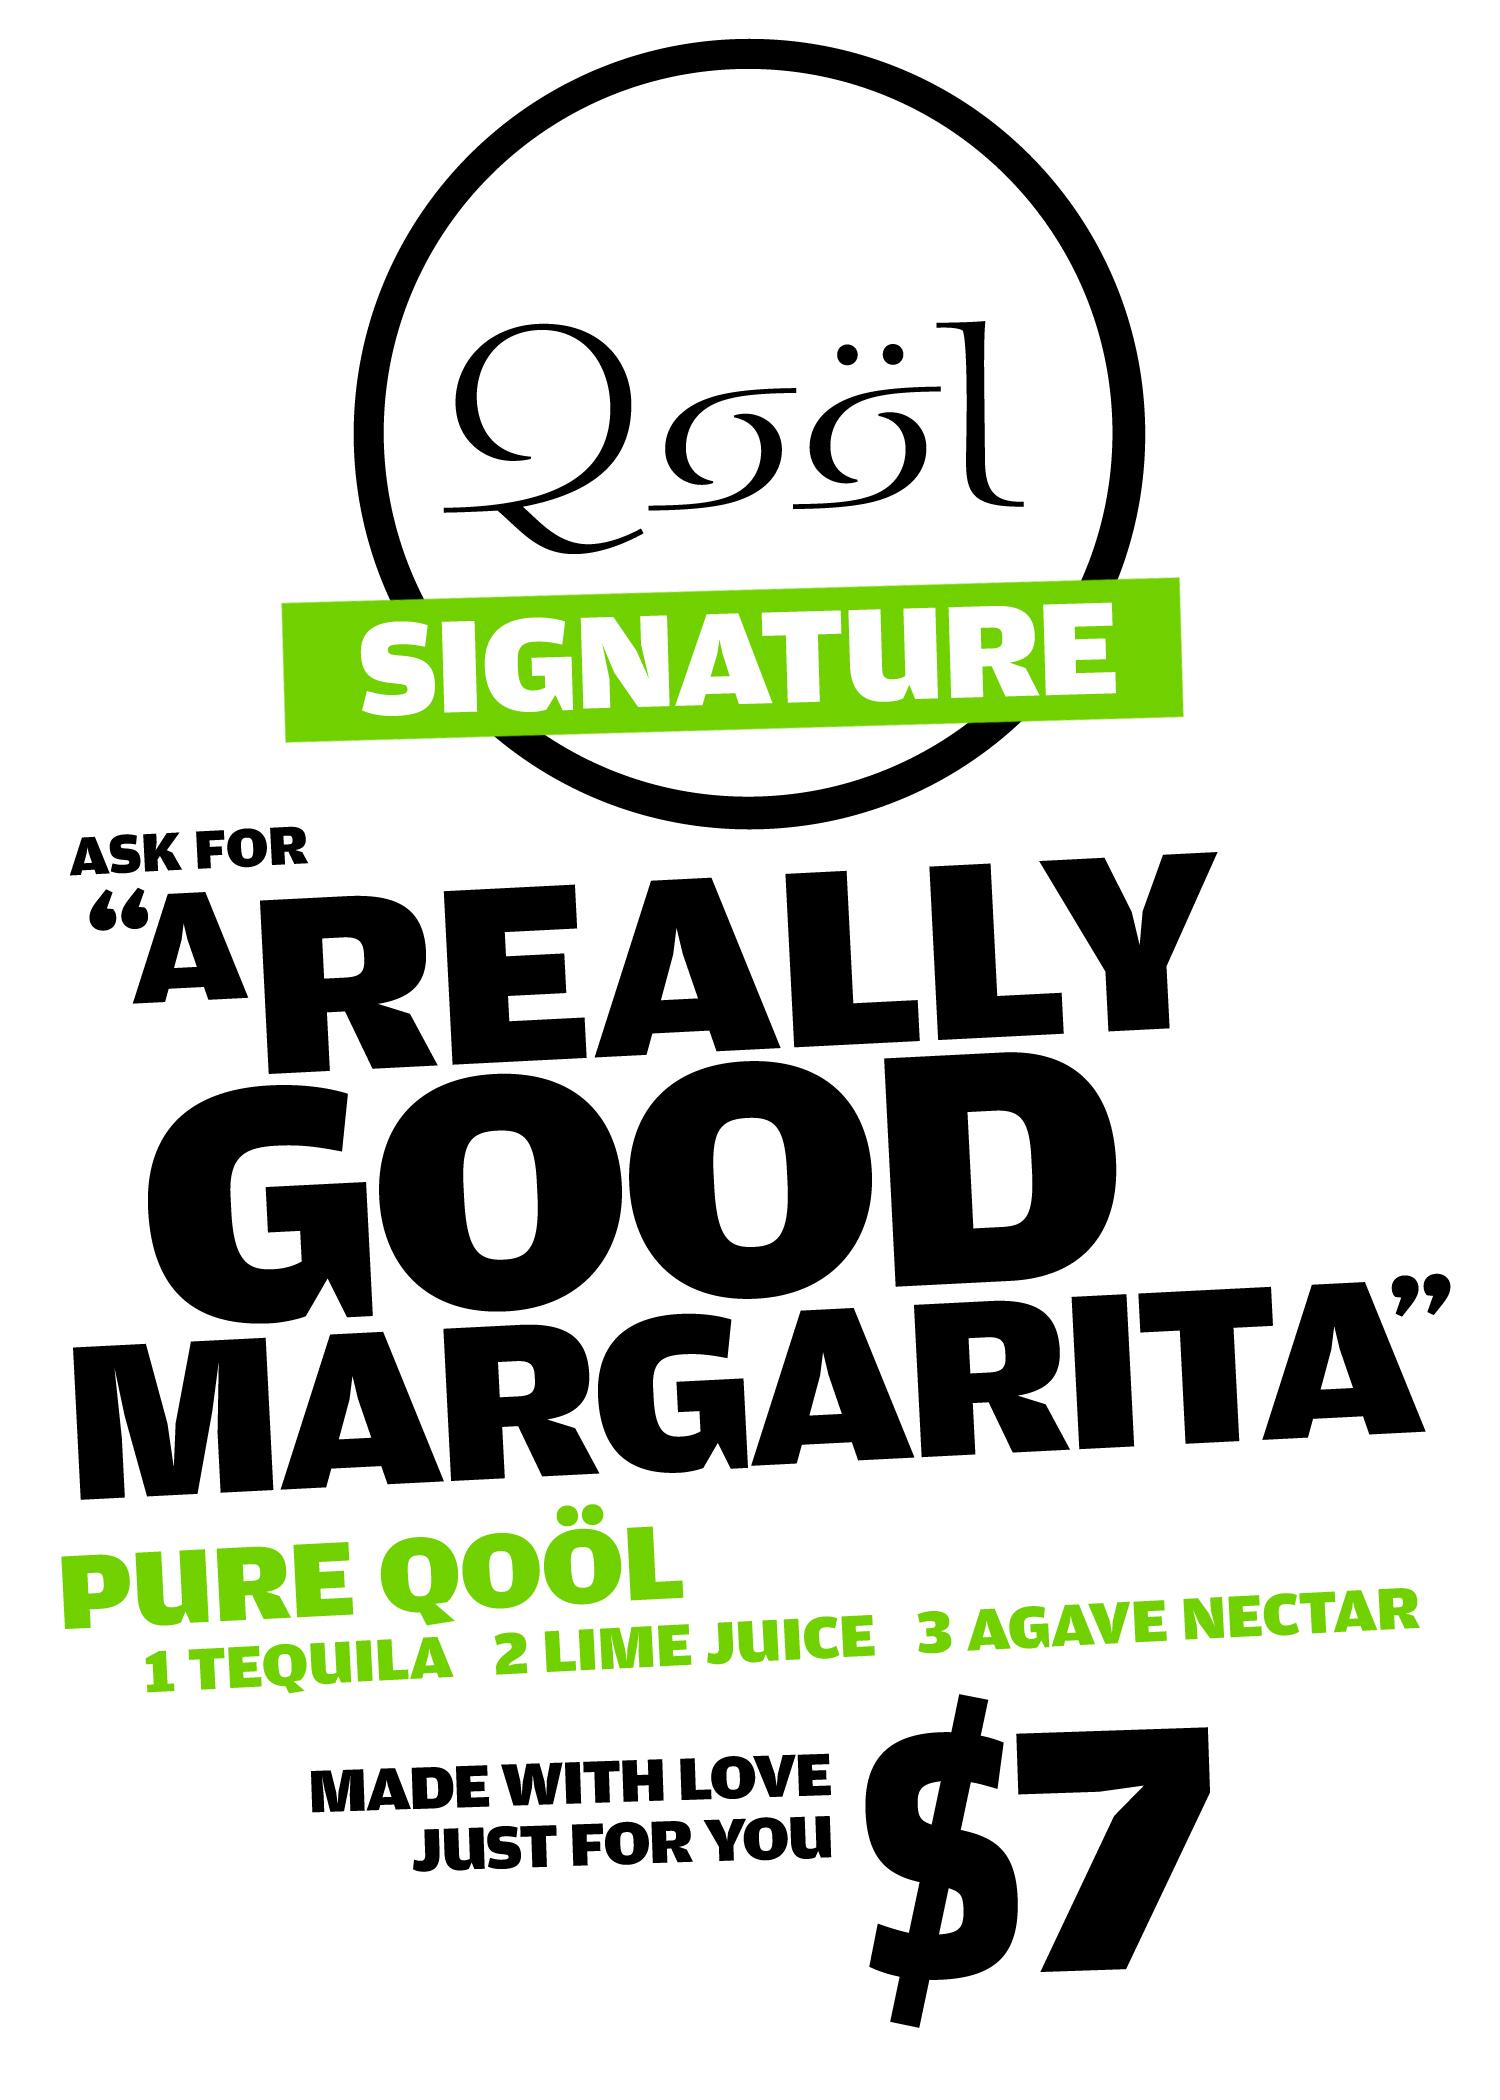 Qool Signature Margarita.jpg